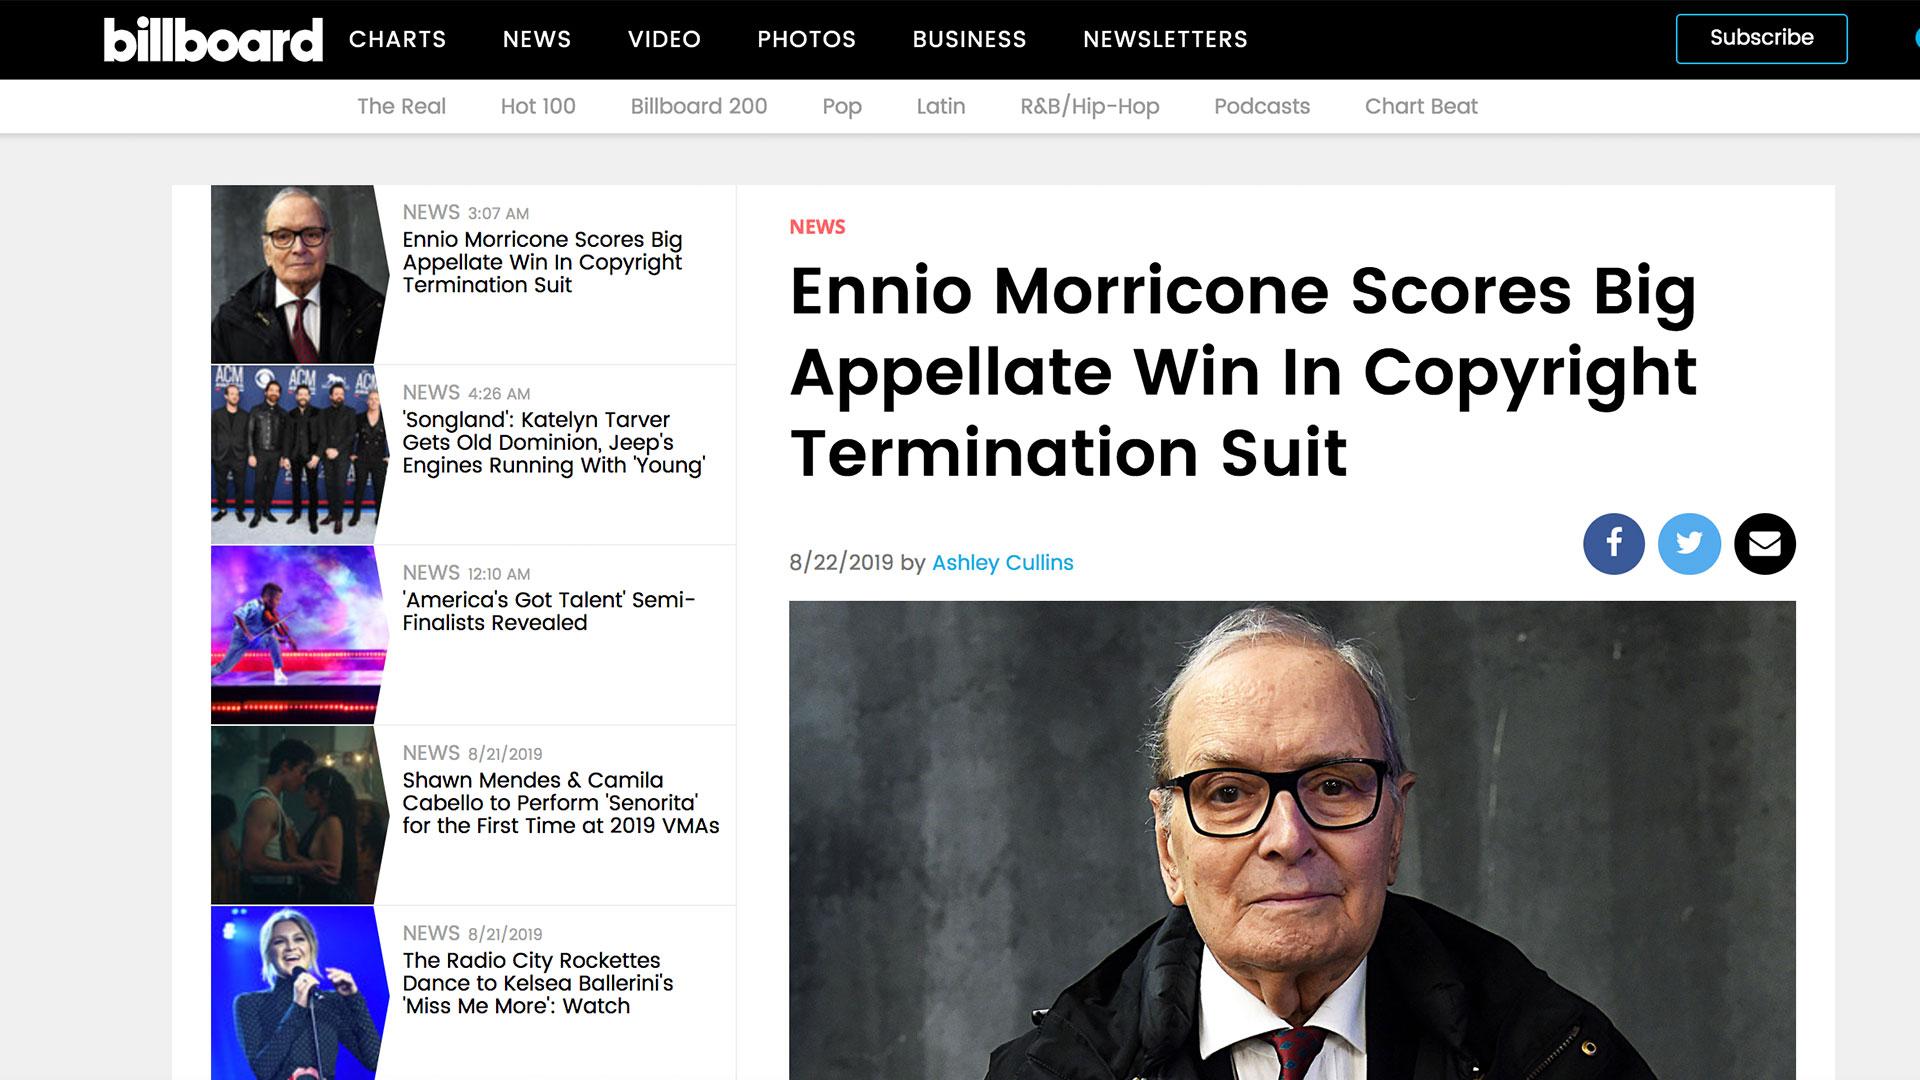 Fairness Rocks News Ennio Morricone Scores Big Appellate Win In Copyright Termination Suit